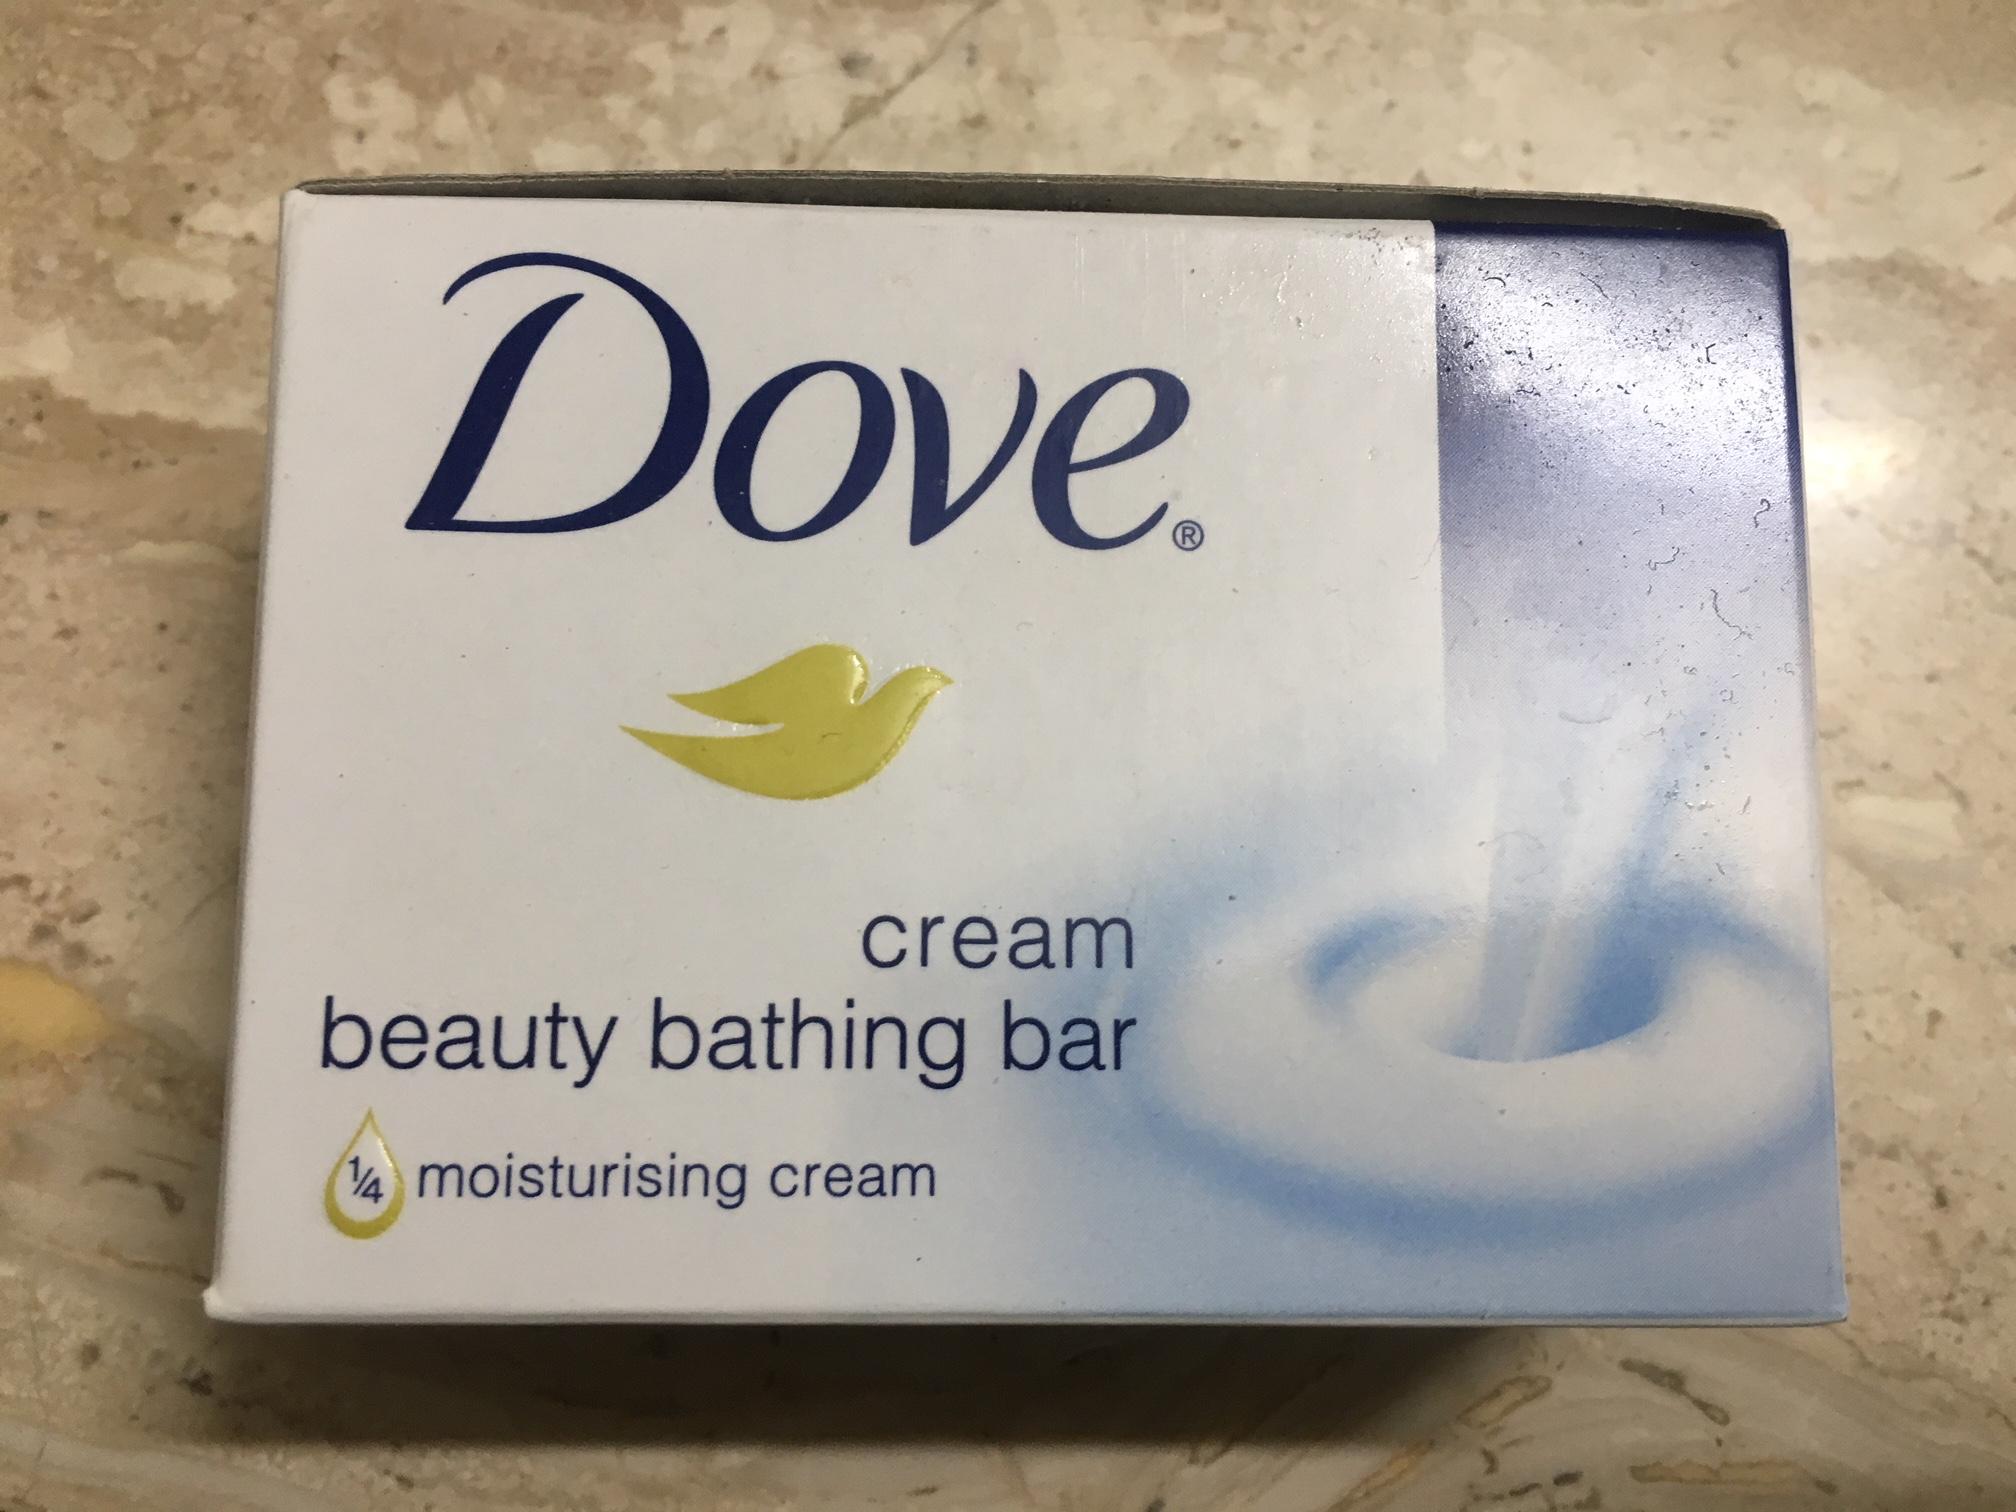 Dove Cream Beauty Bathing Bar-Amazing-By prernakapur